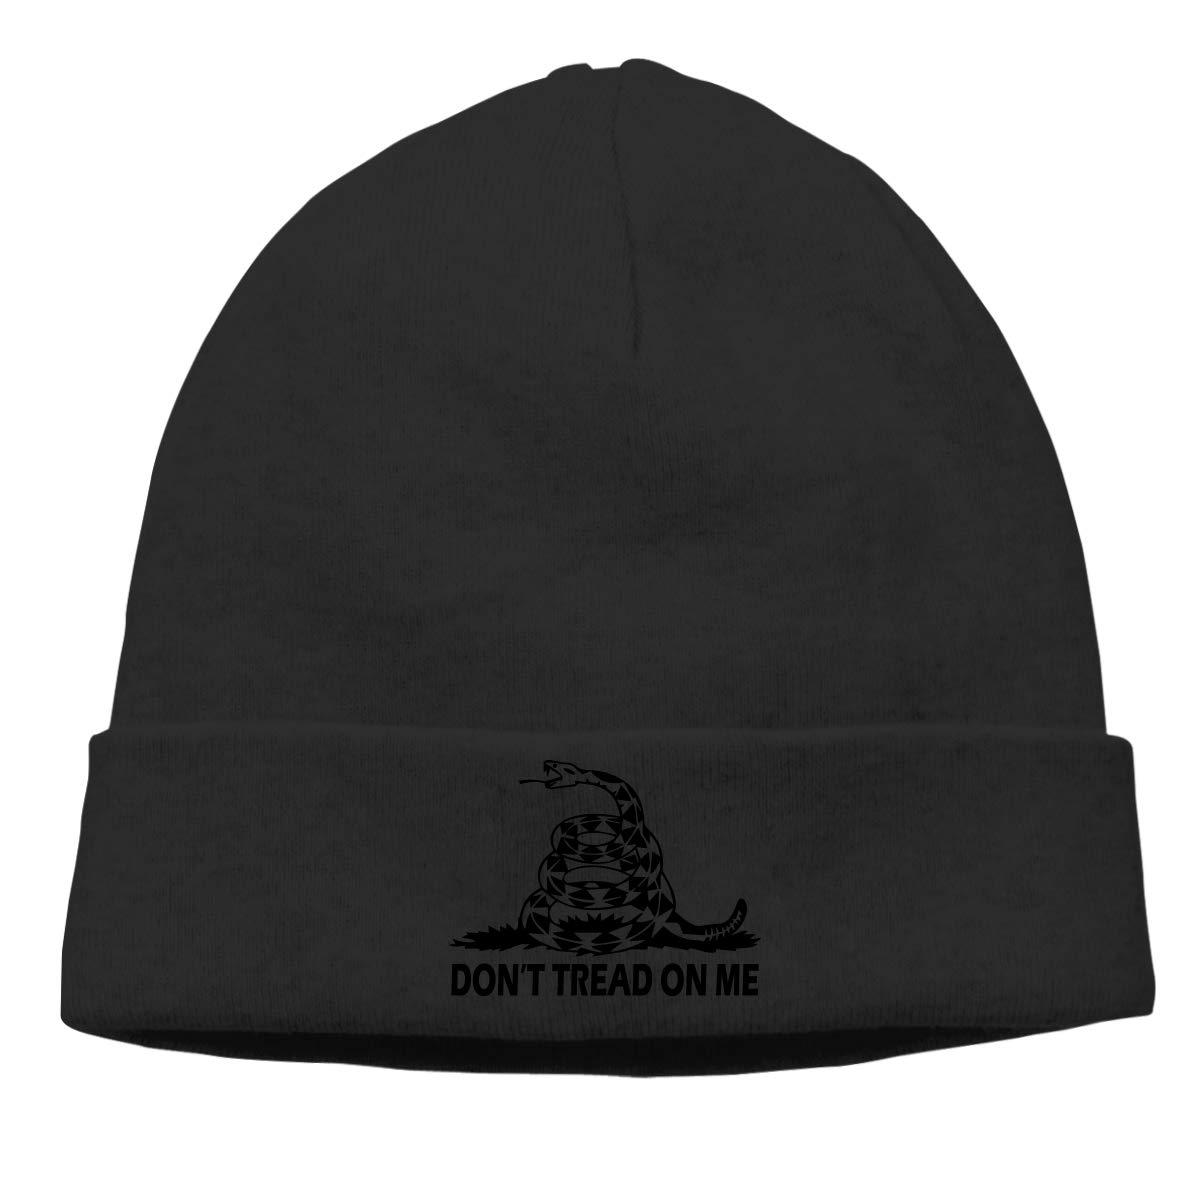 76741a2d89d Amazon.com  Gkf Knit Beanie Hat Warm Skull Cap Dont Tread Fold Beanie  Toque  Clothing